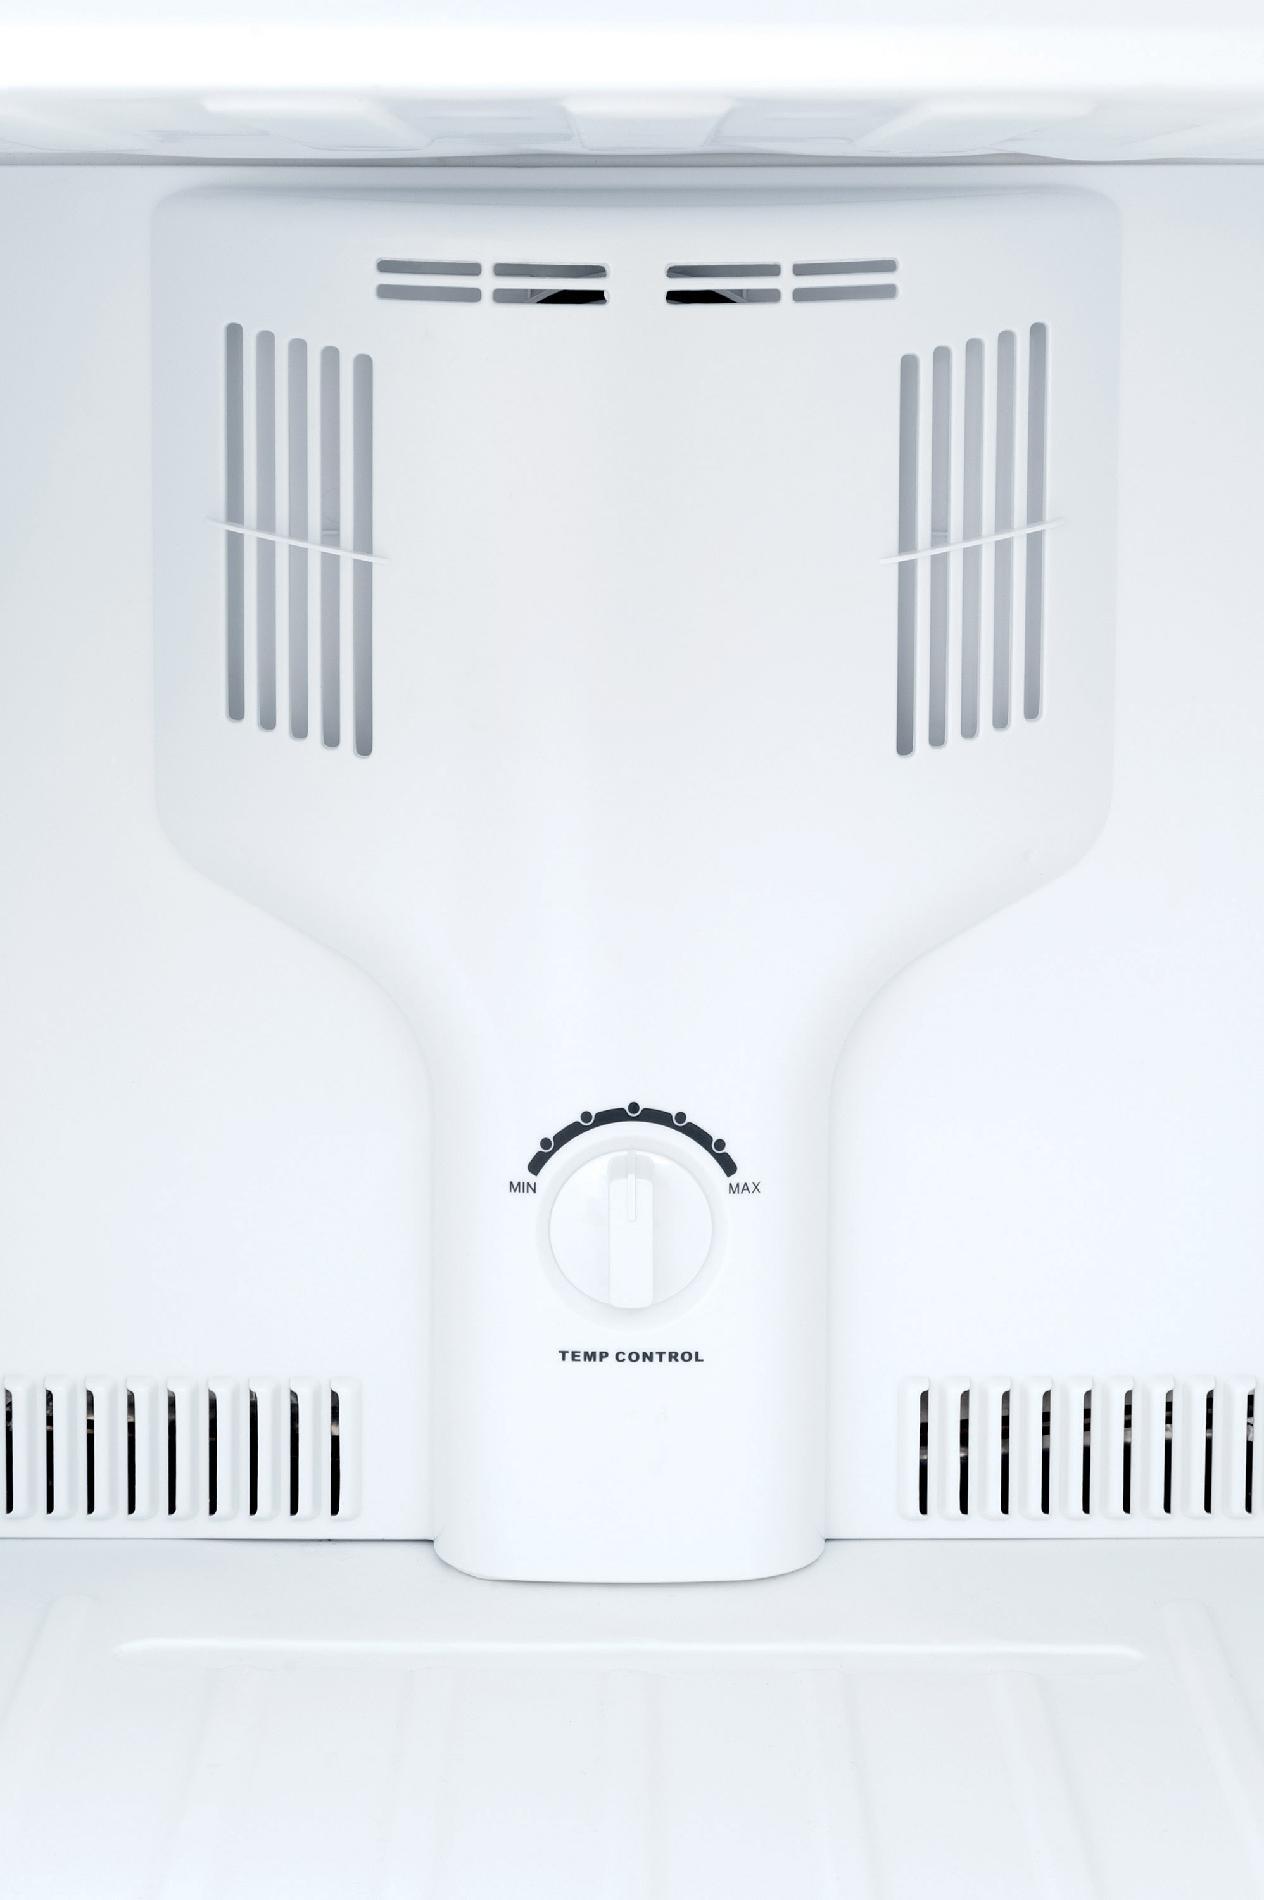 Frigidaire 10.0 cu. ft. Top-Freezer Refrigerator - Black